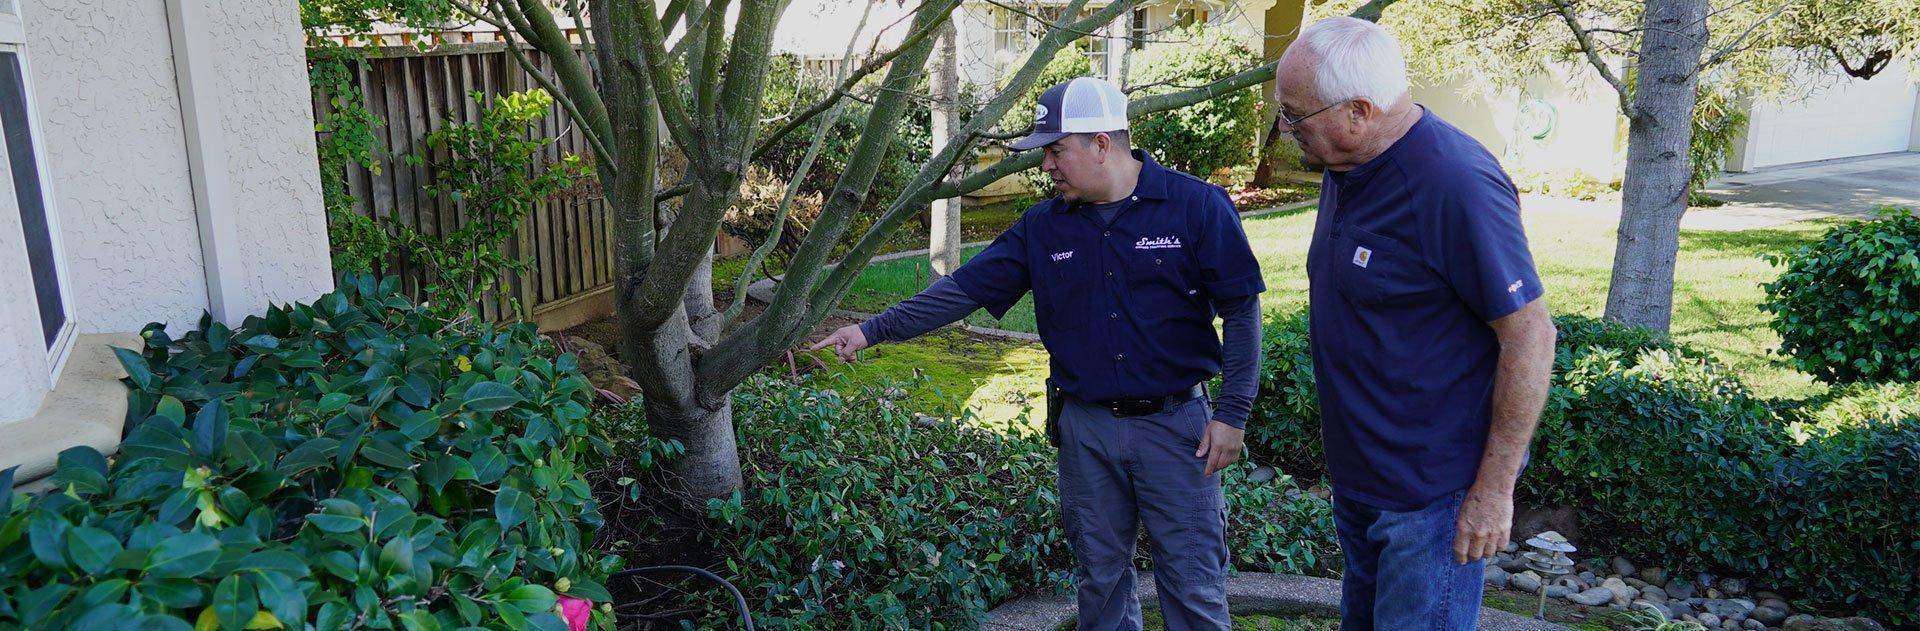 smith's pest management technician with client